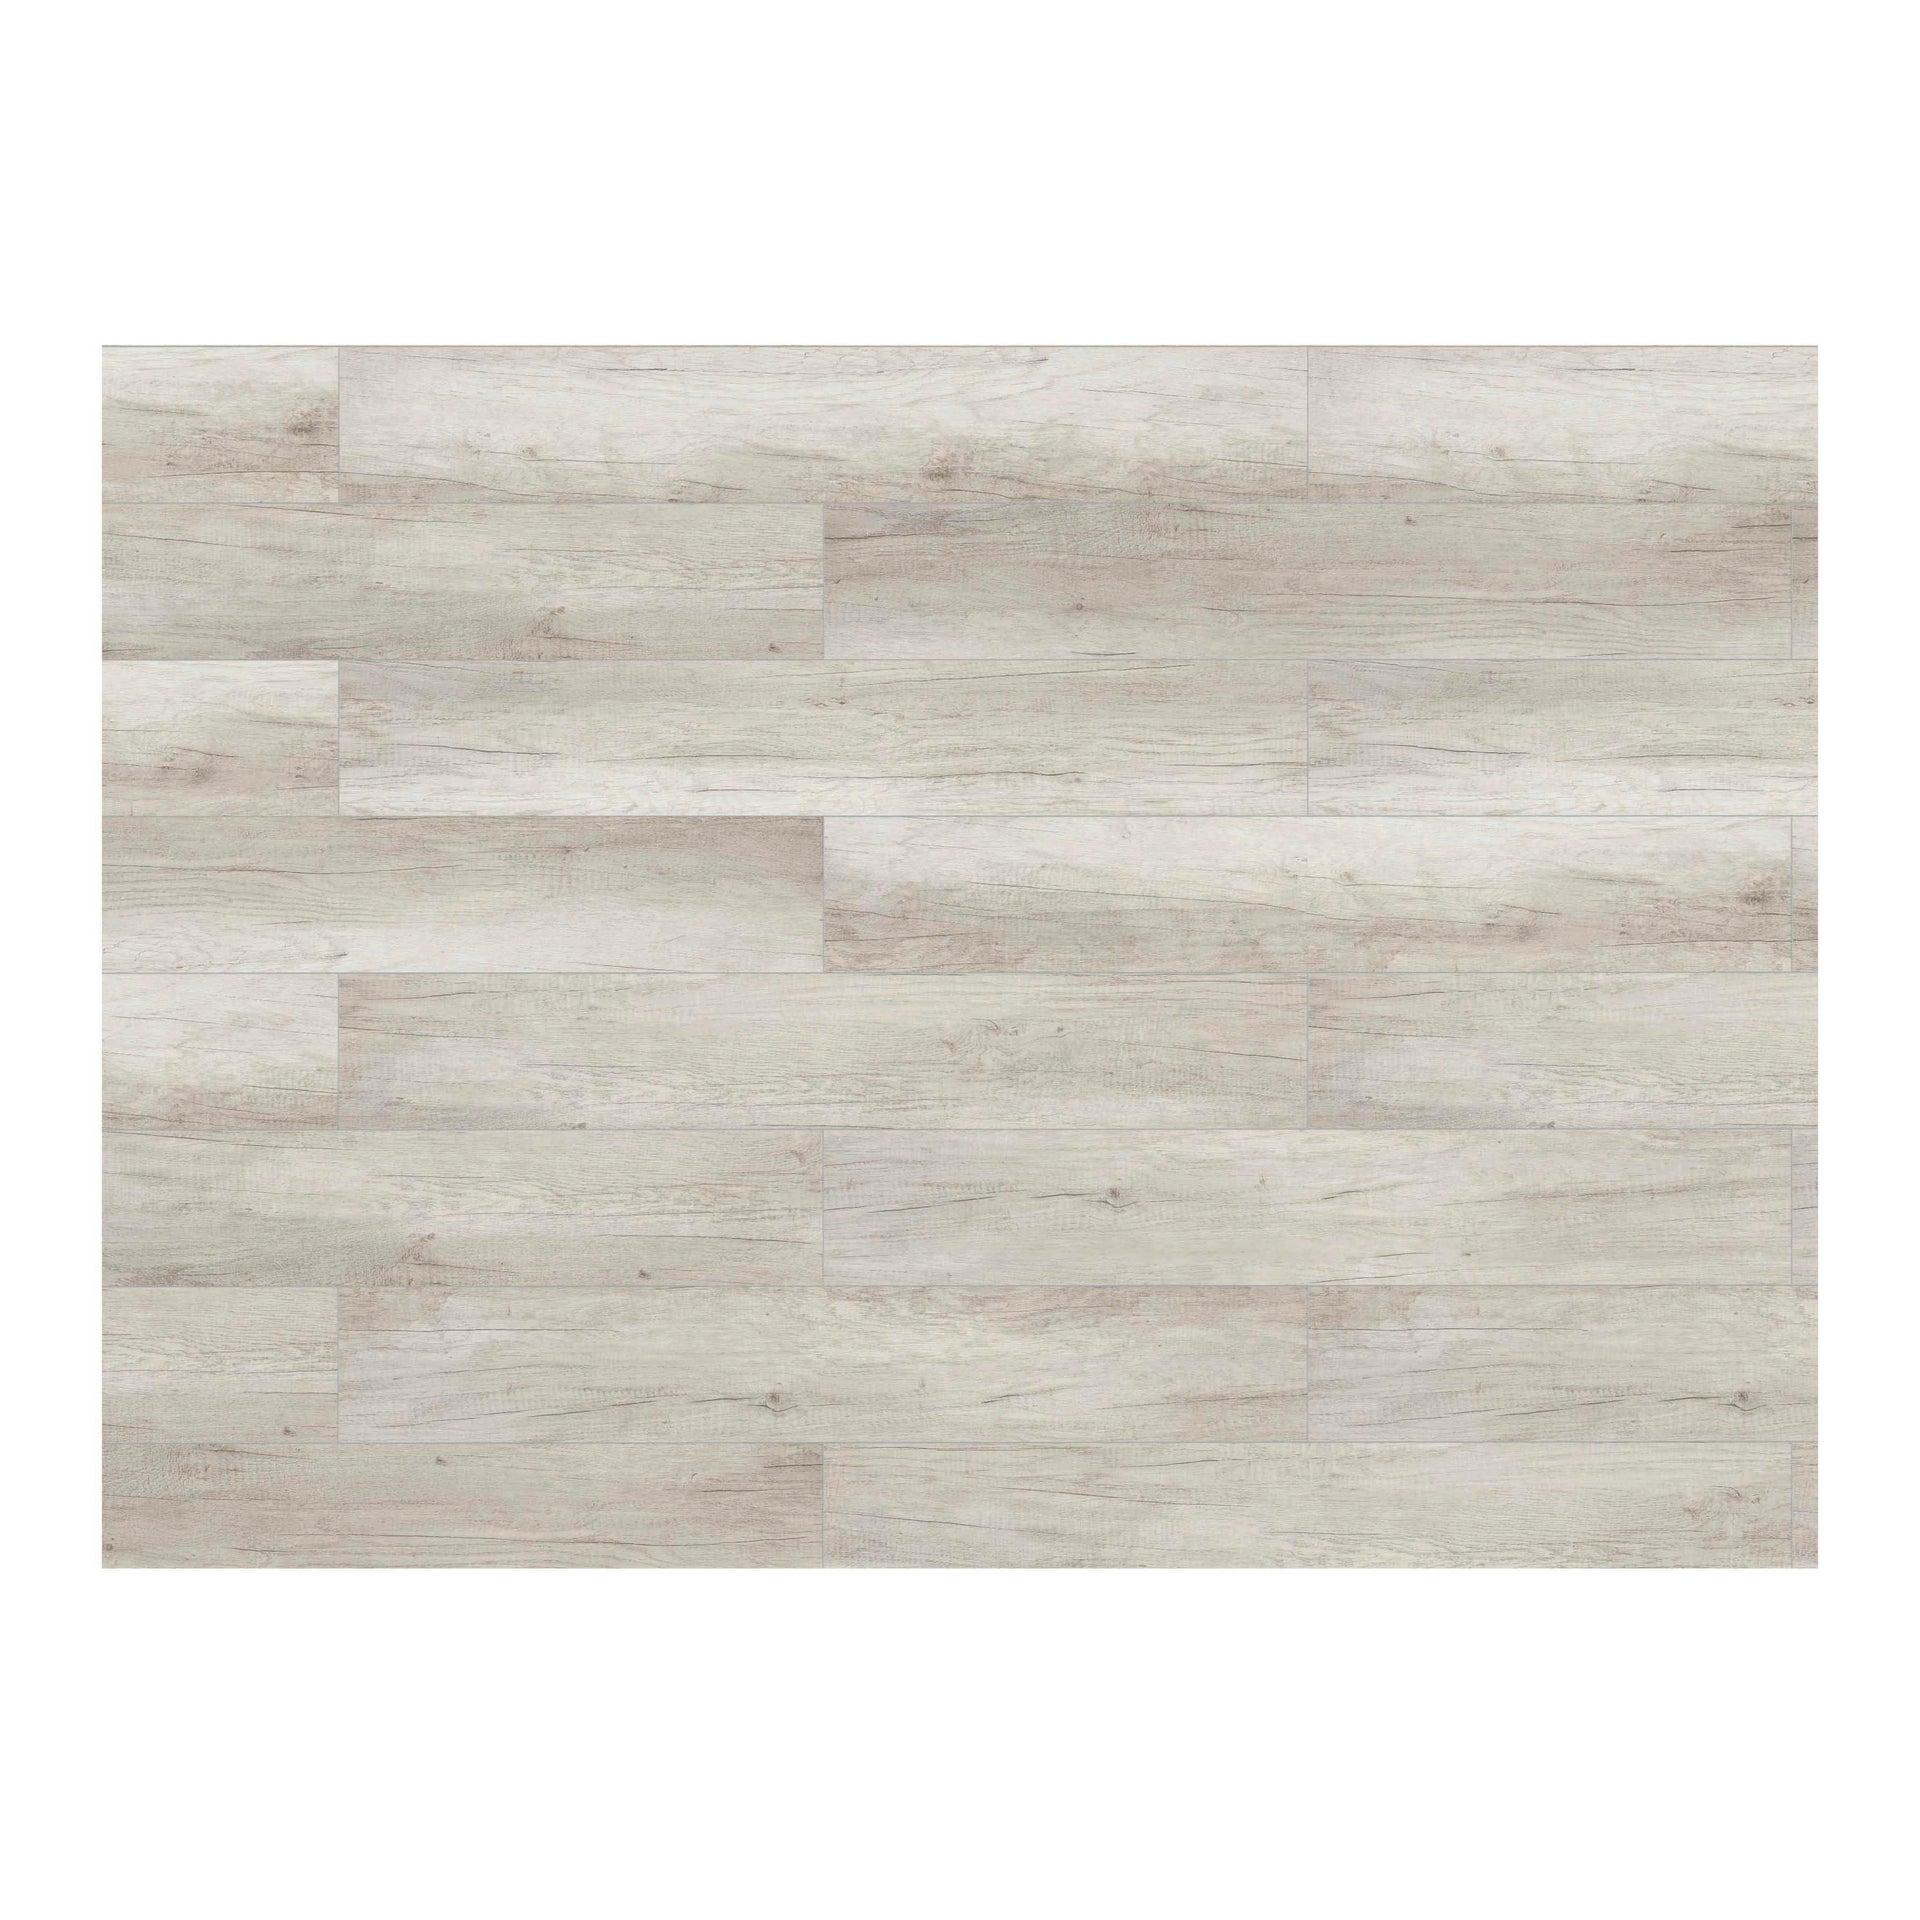 Pavimento laminato H2O Oak Sp 8 mm grigio / argento - 4